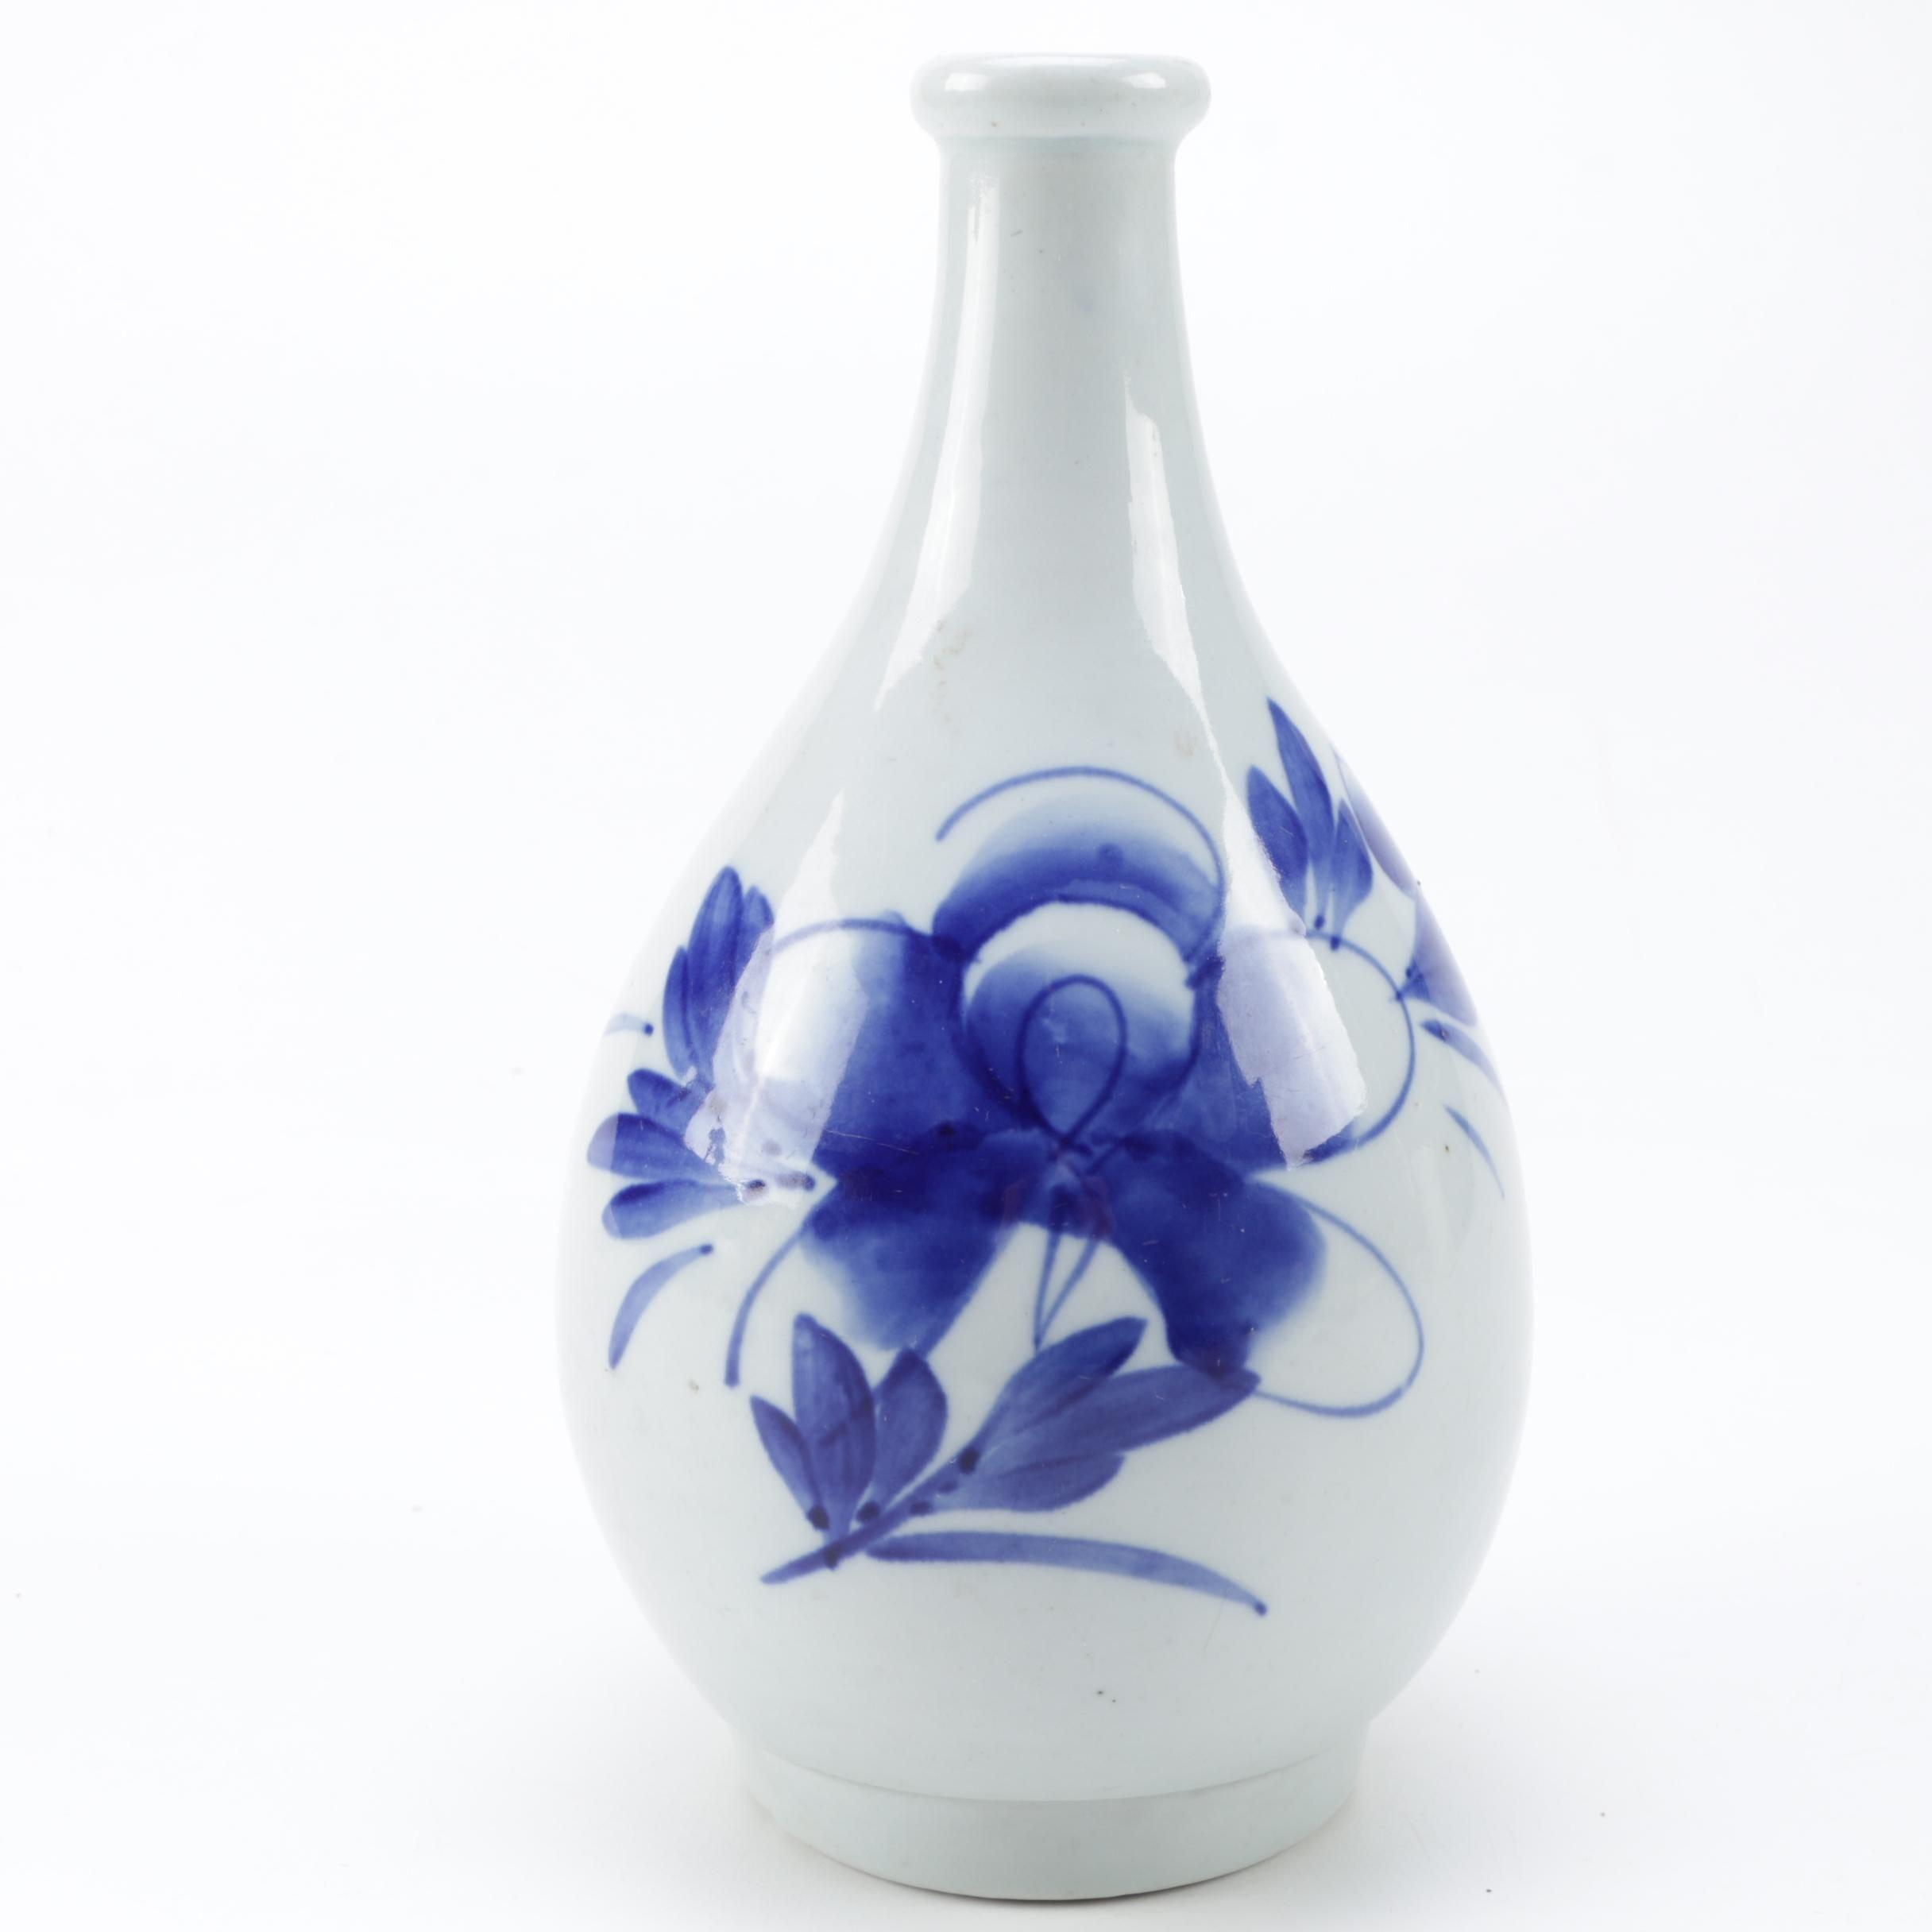 Antique Porcelain Saki Bottle